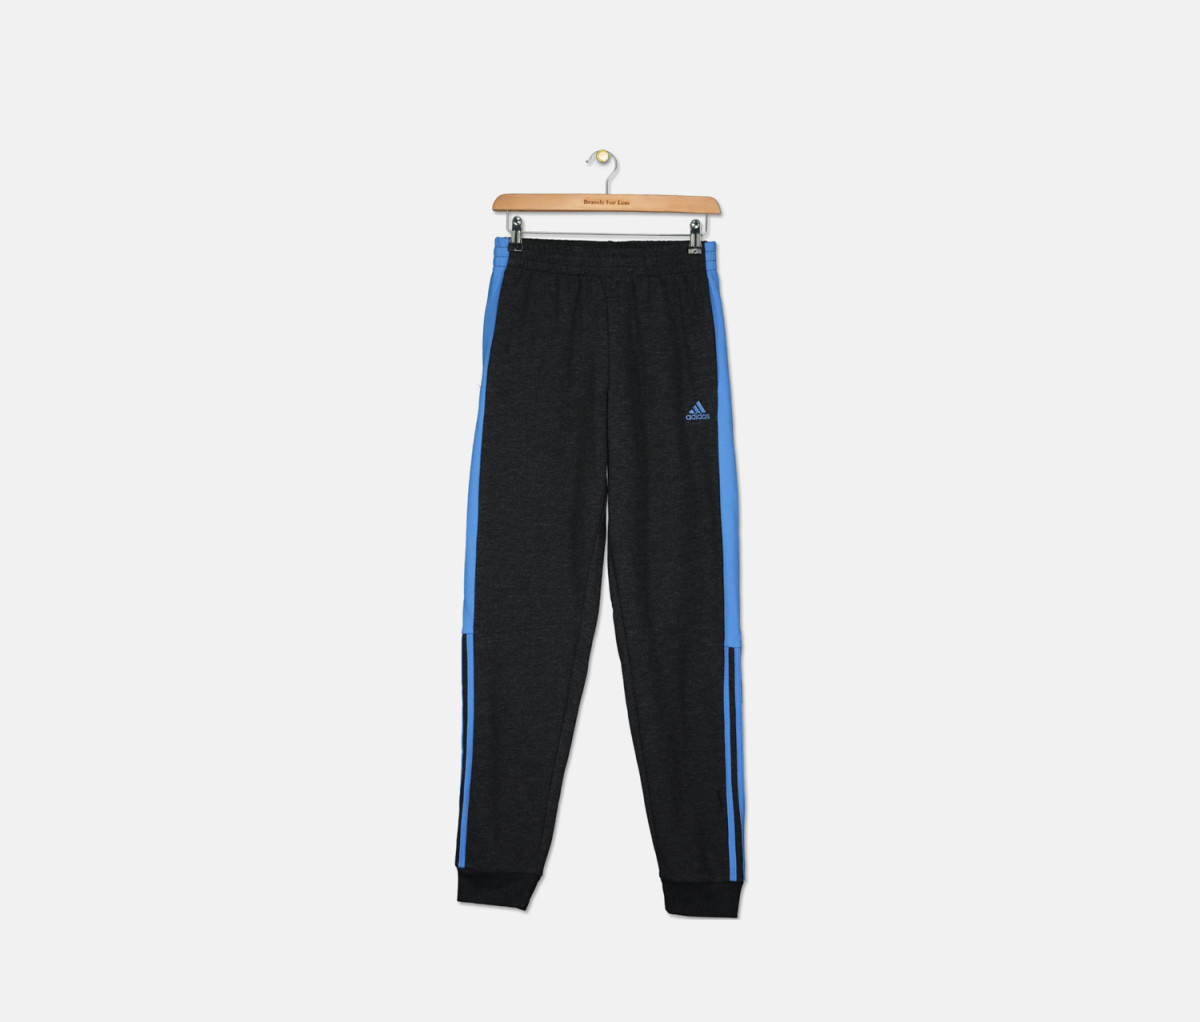 Adidas Big Boys Athletics Youth Jogger Pants  Black